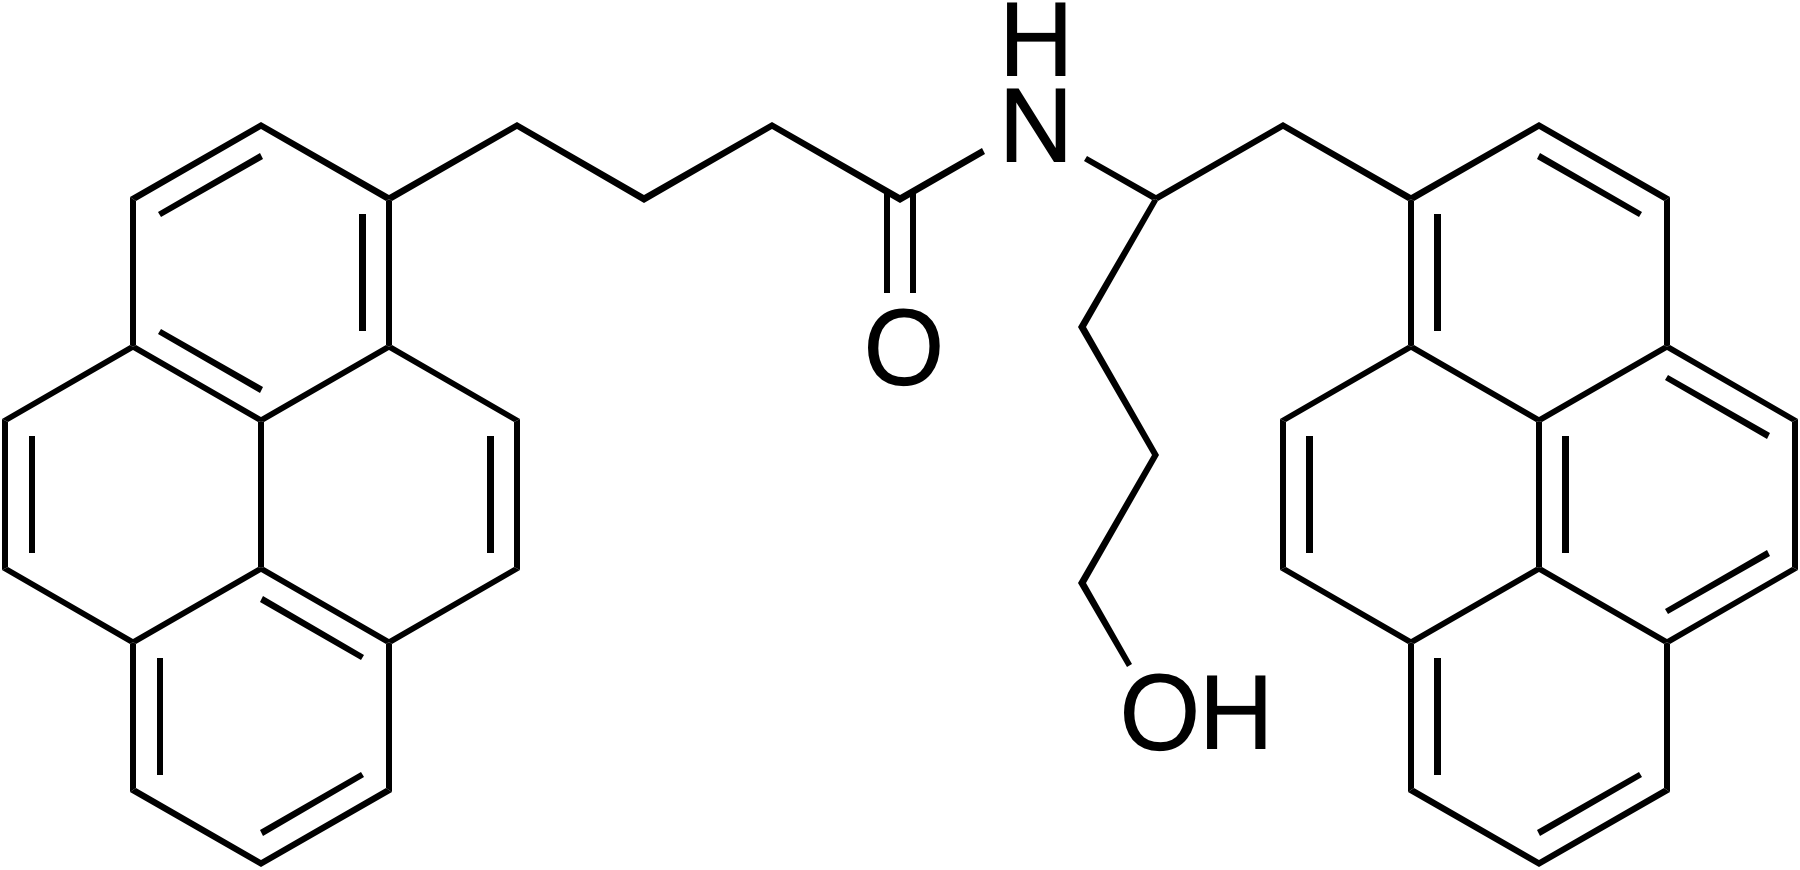 N-[4-(1